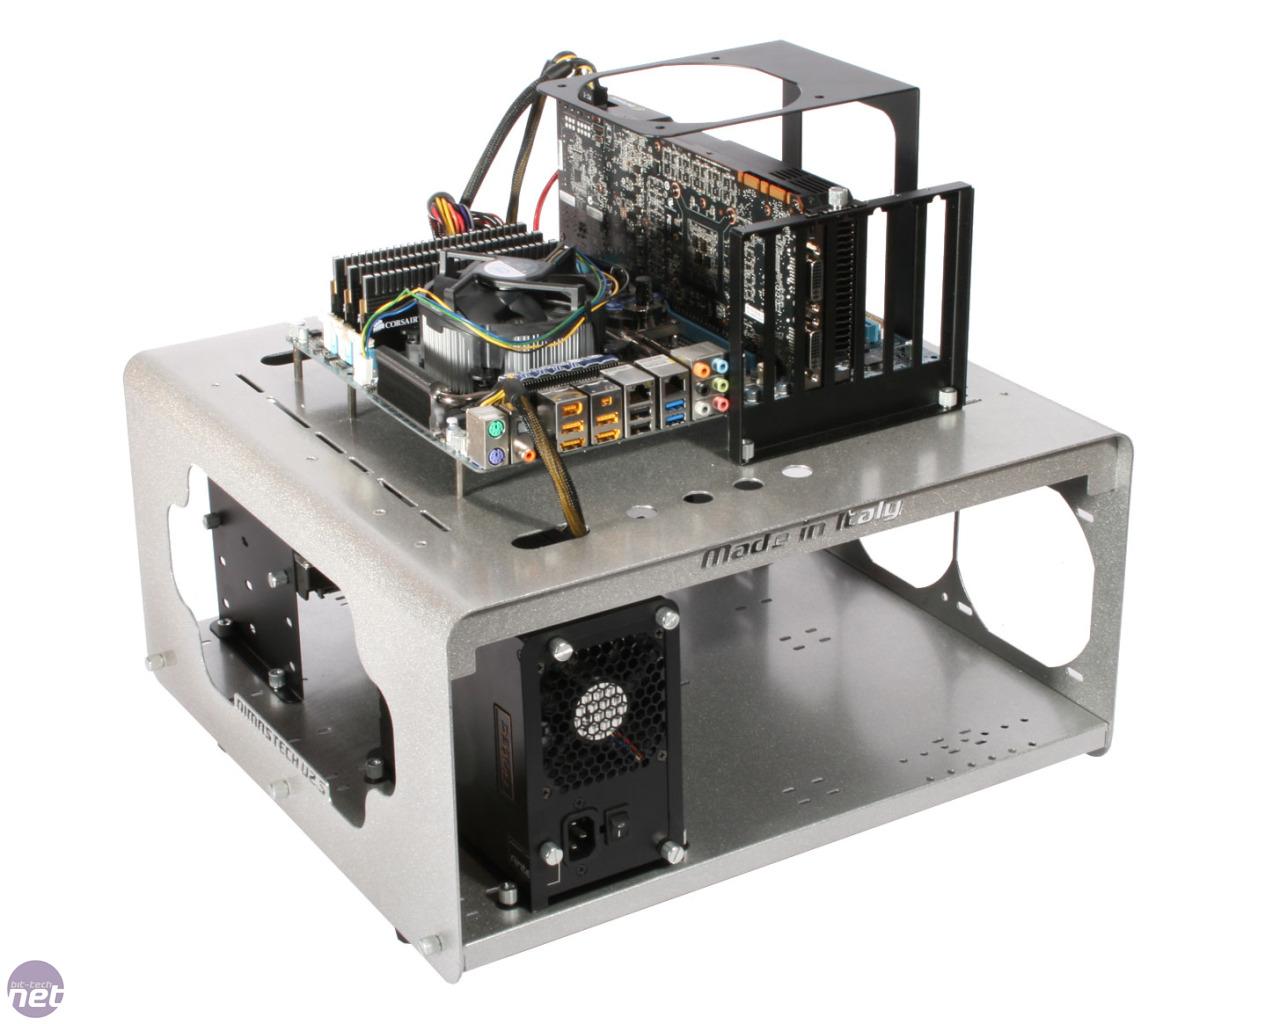 Dimastech Bench Test Table Easy V2 5 Review Bit Tech Net